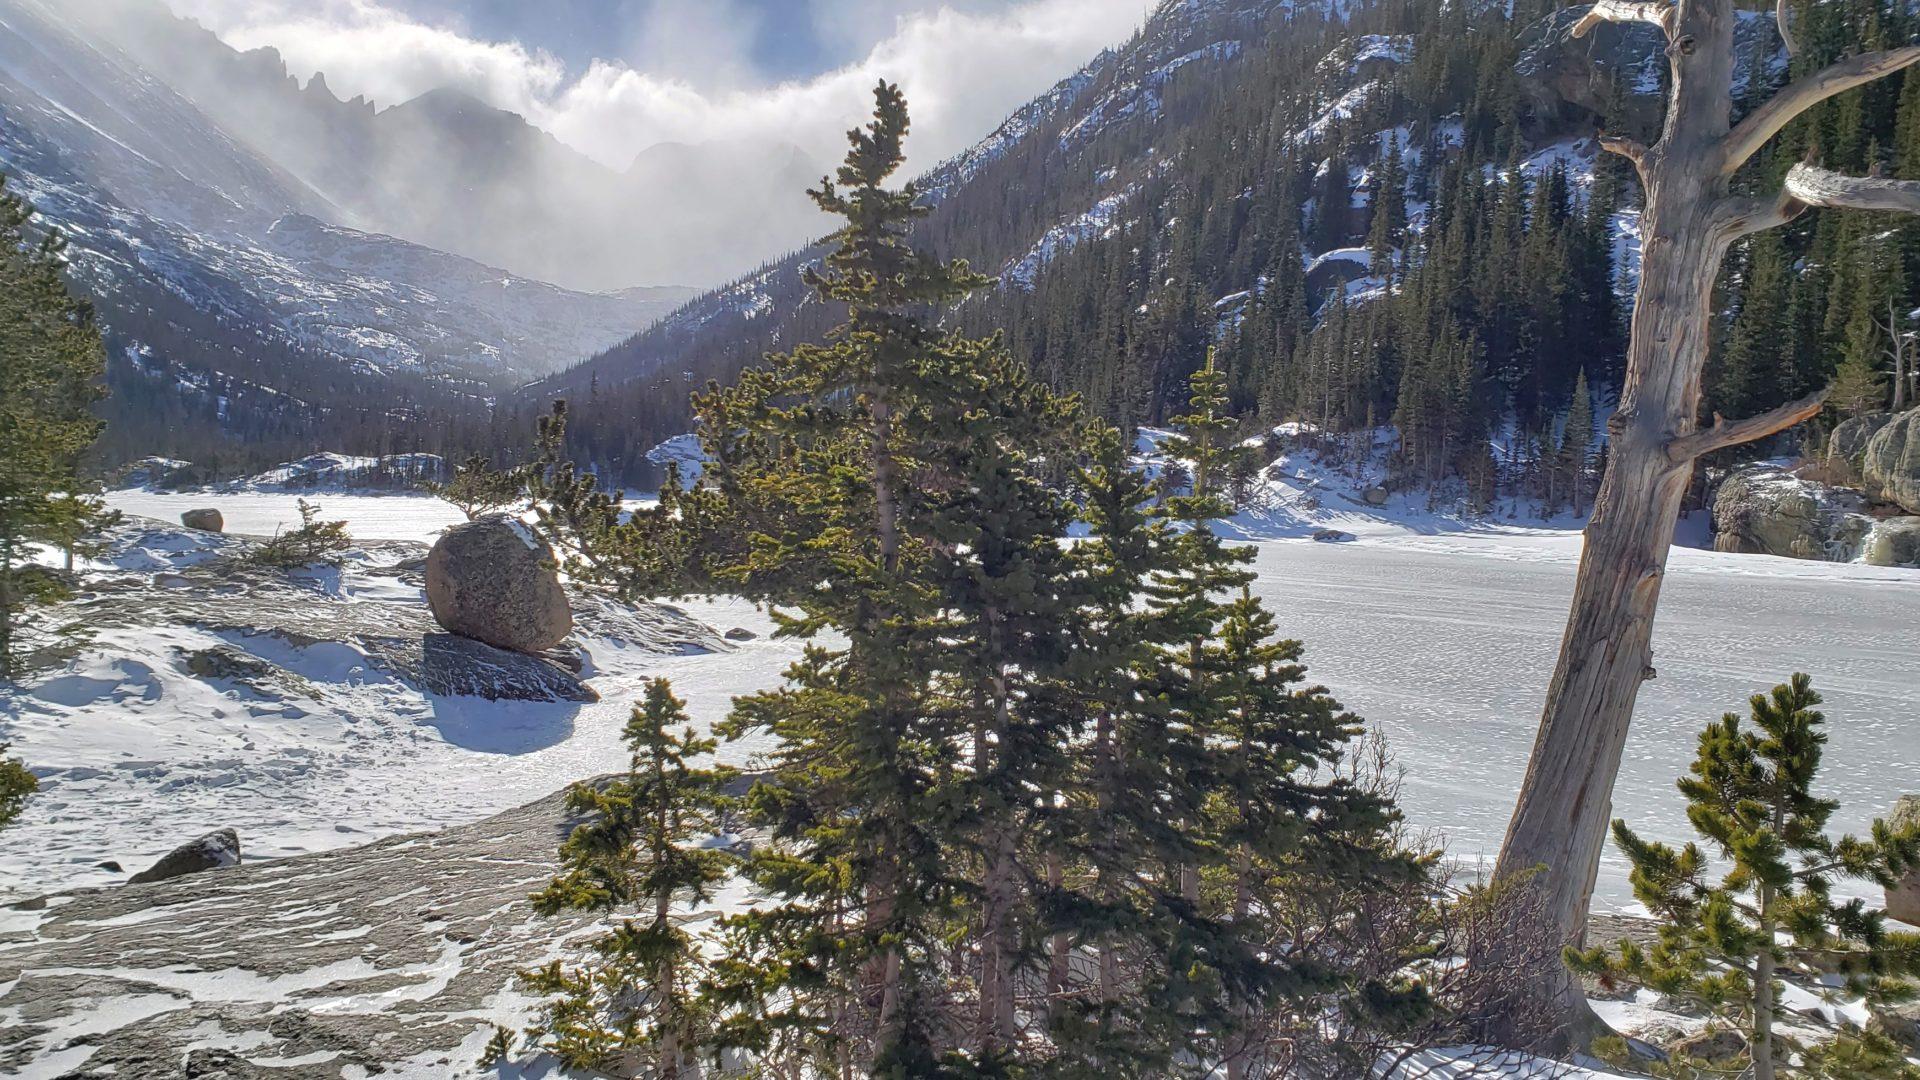 Permalink to: Mills 9,965′ and Jewel 9,990′ Lake